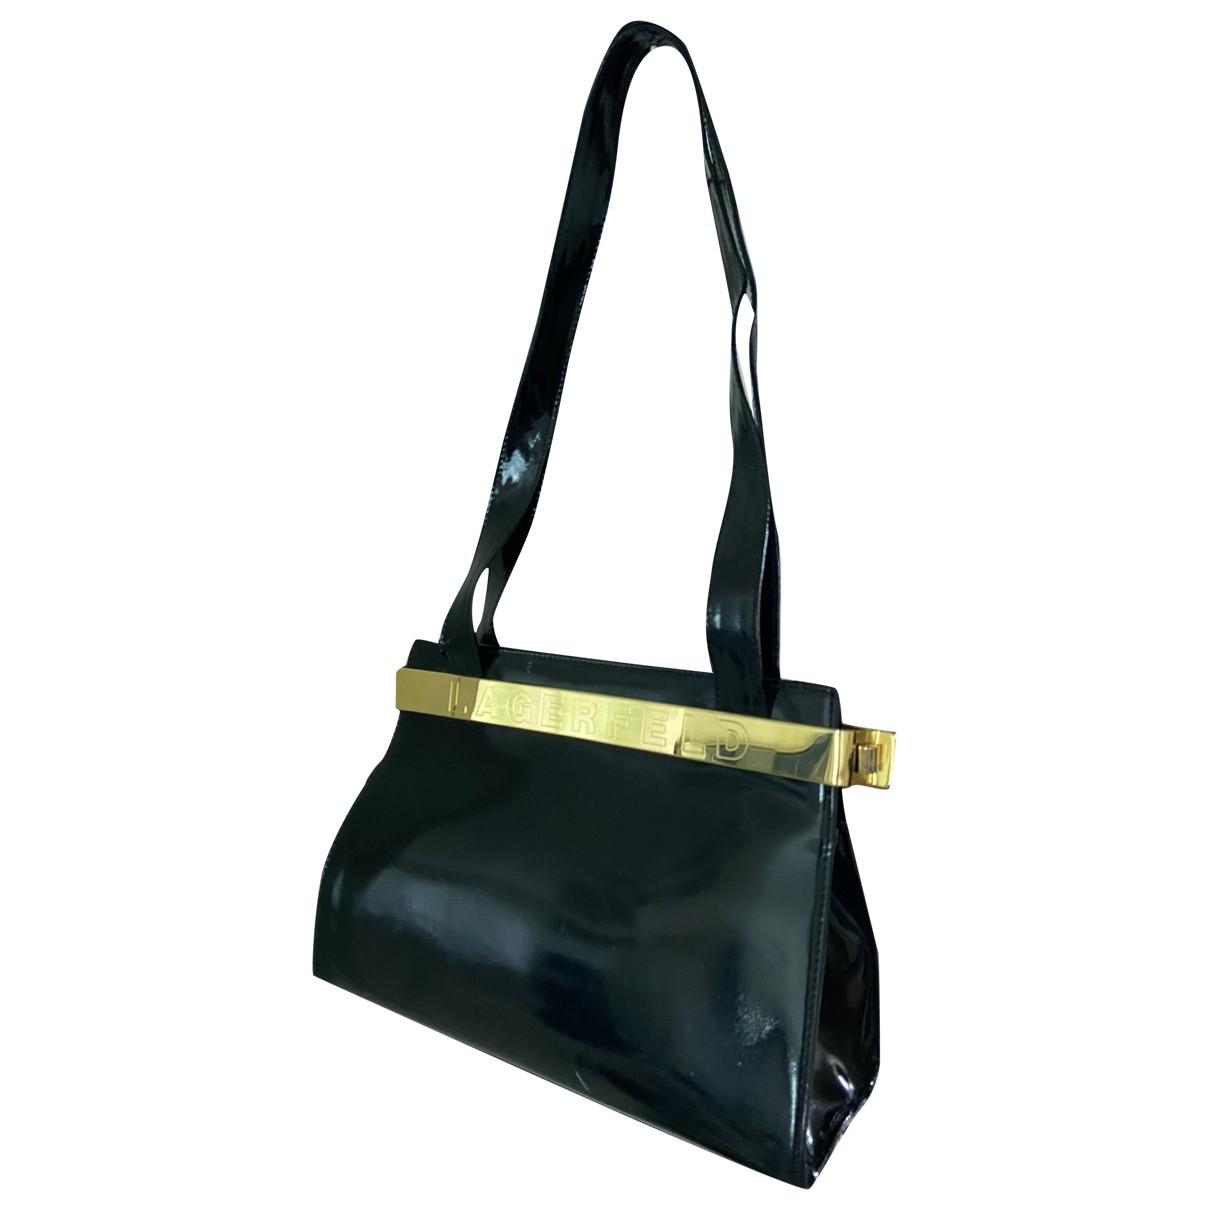 Karl Lagerfeld \N Black Patent leather handbag for Women \N